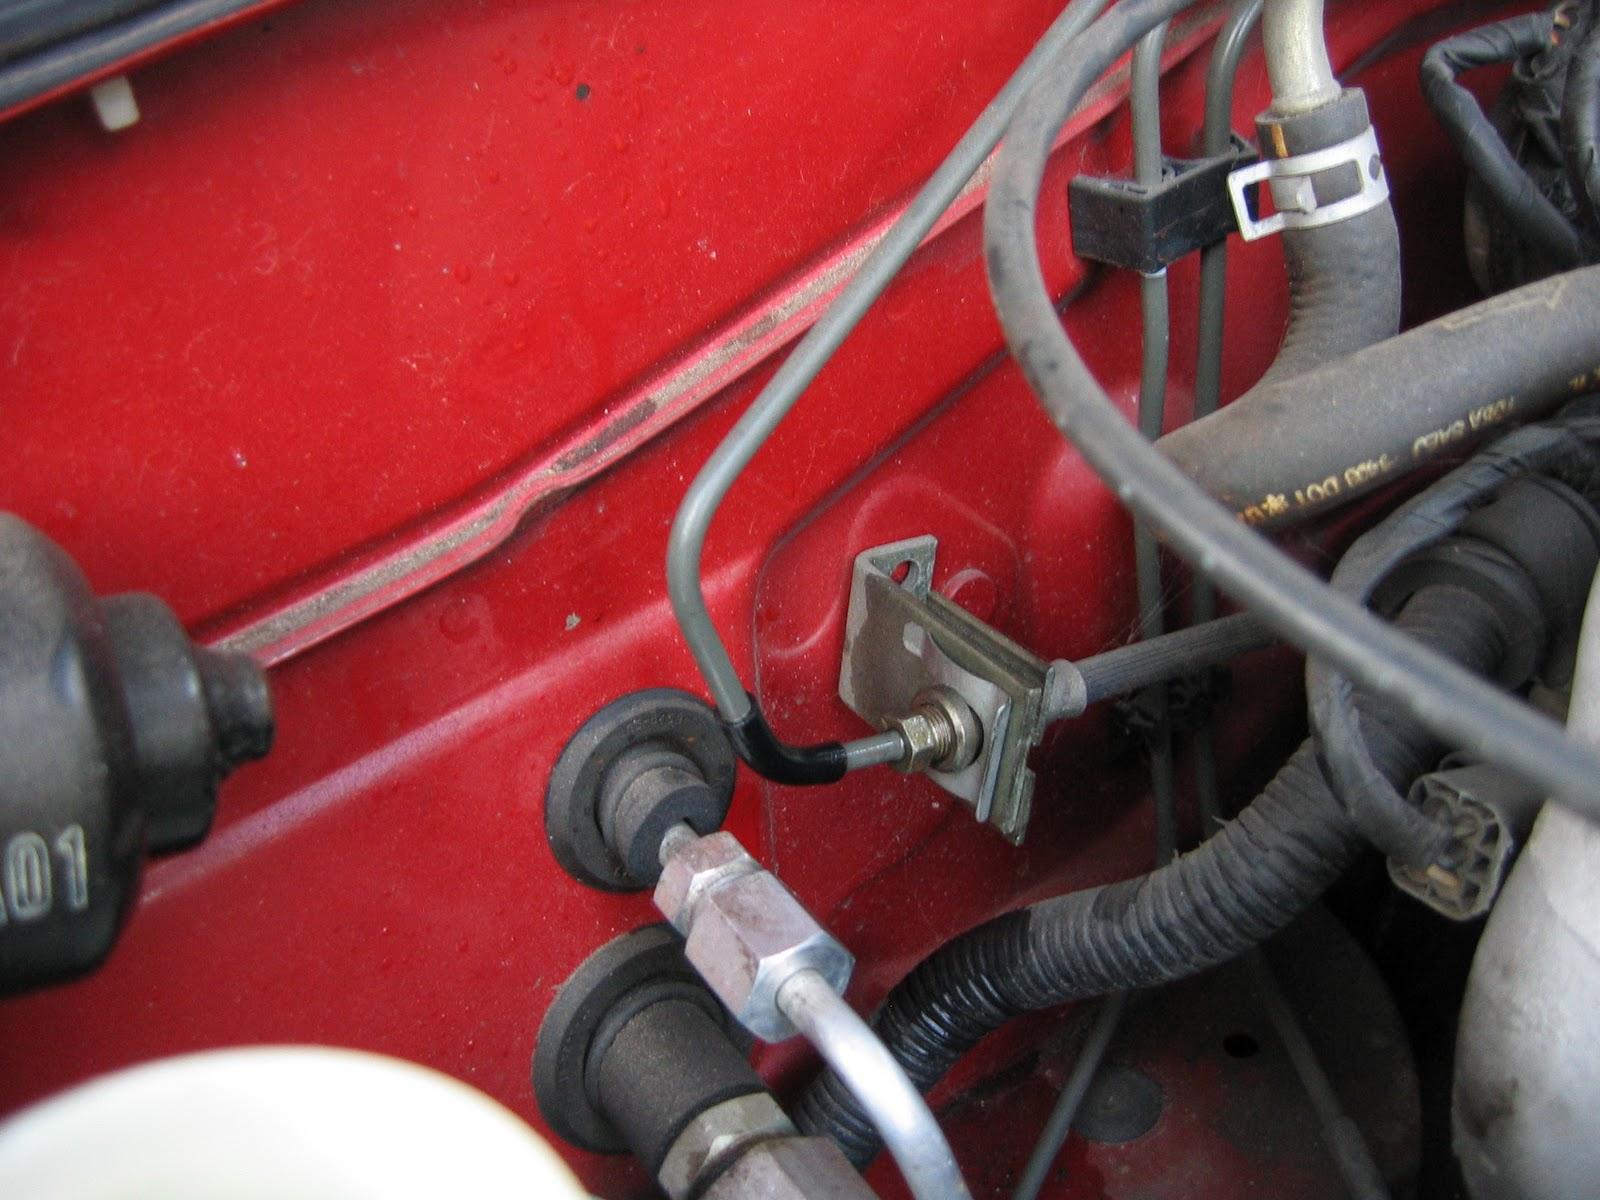 2000 Cavalier Clutch Slave Cylinder Diagram Ford Master 1600x1200